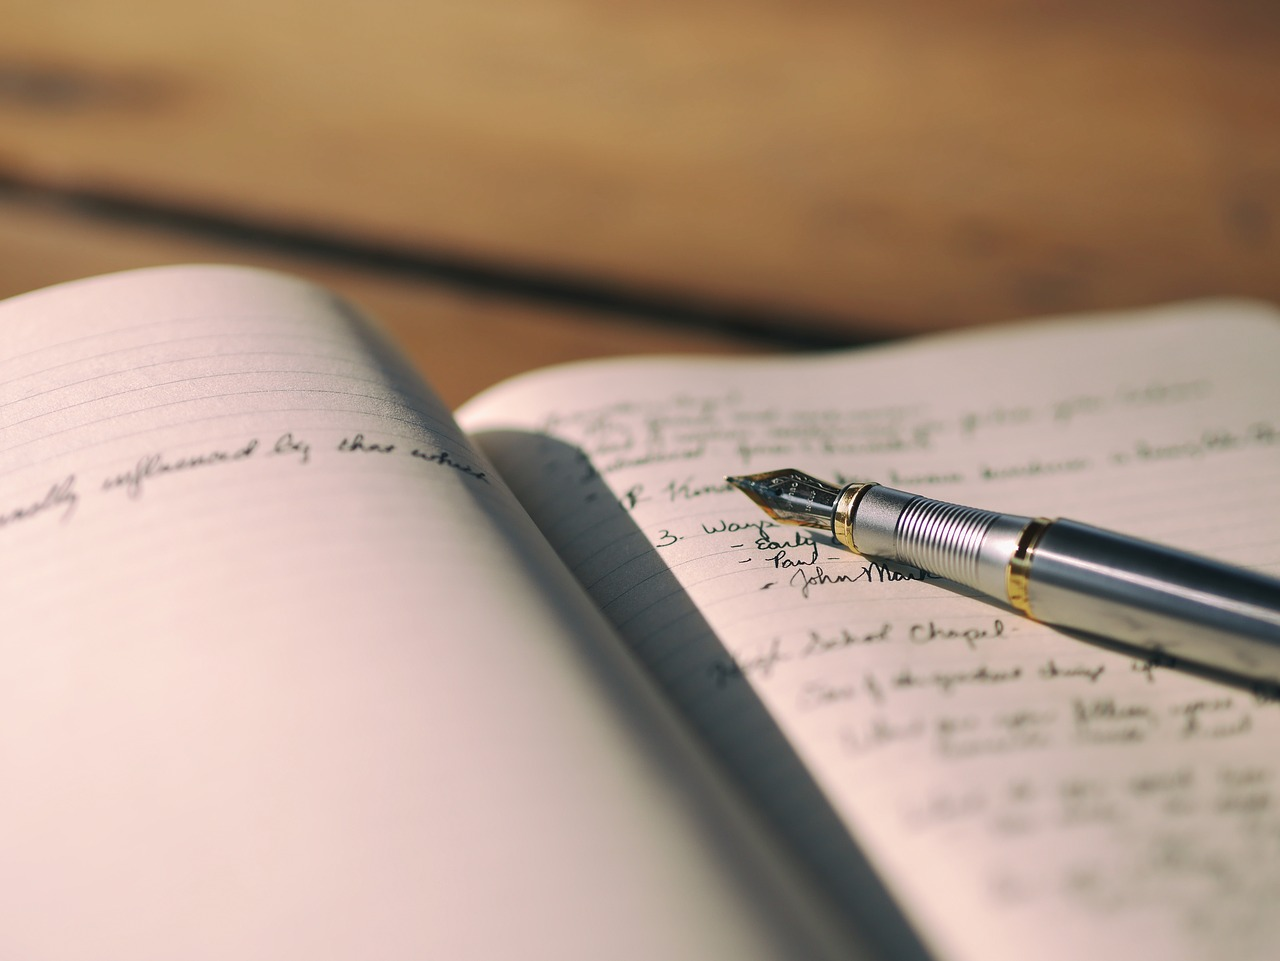 notebook-1840276_1280.jpg